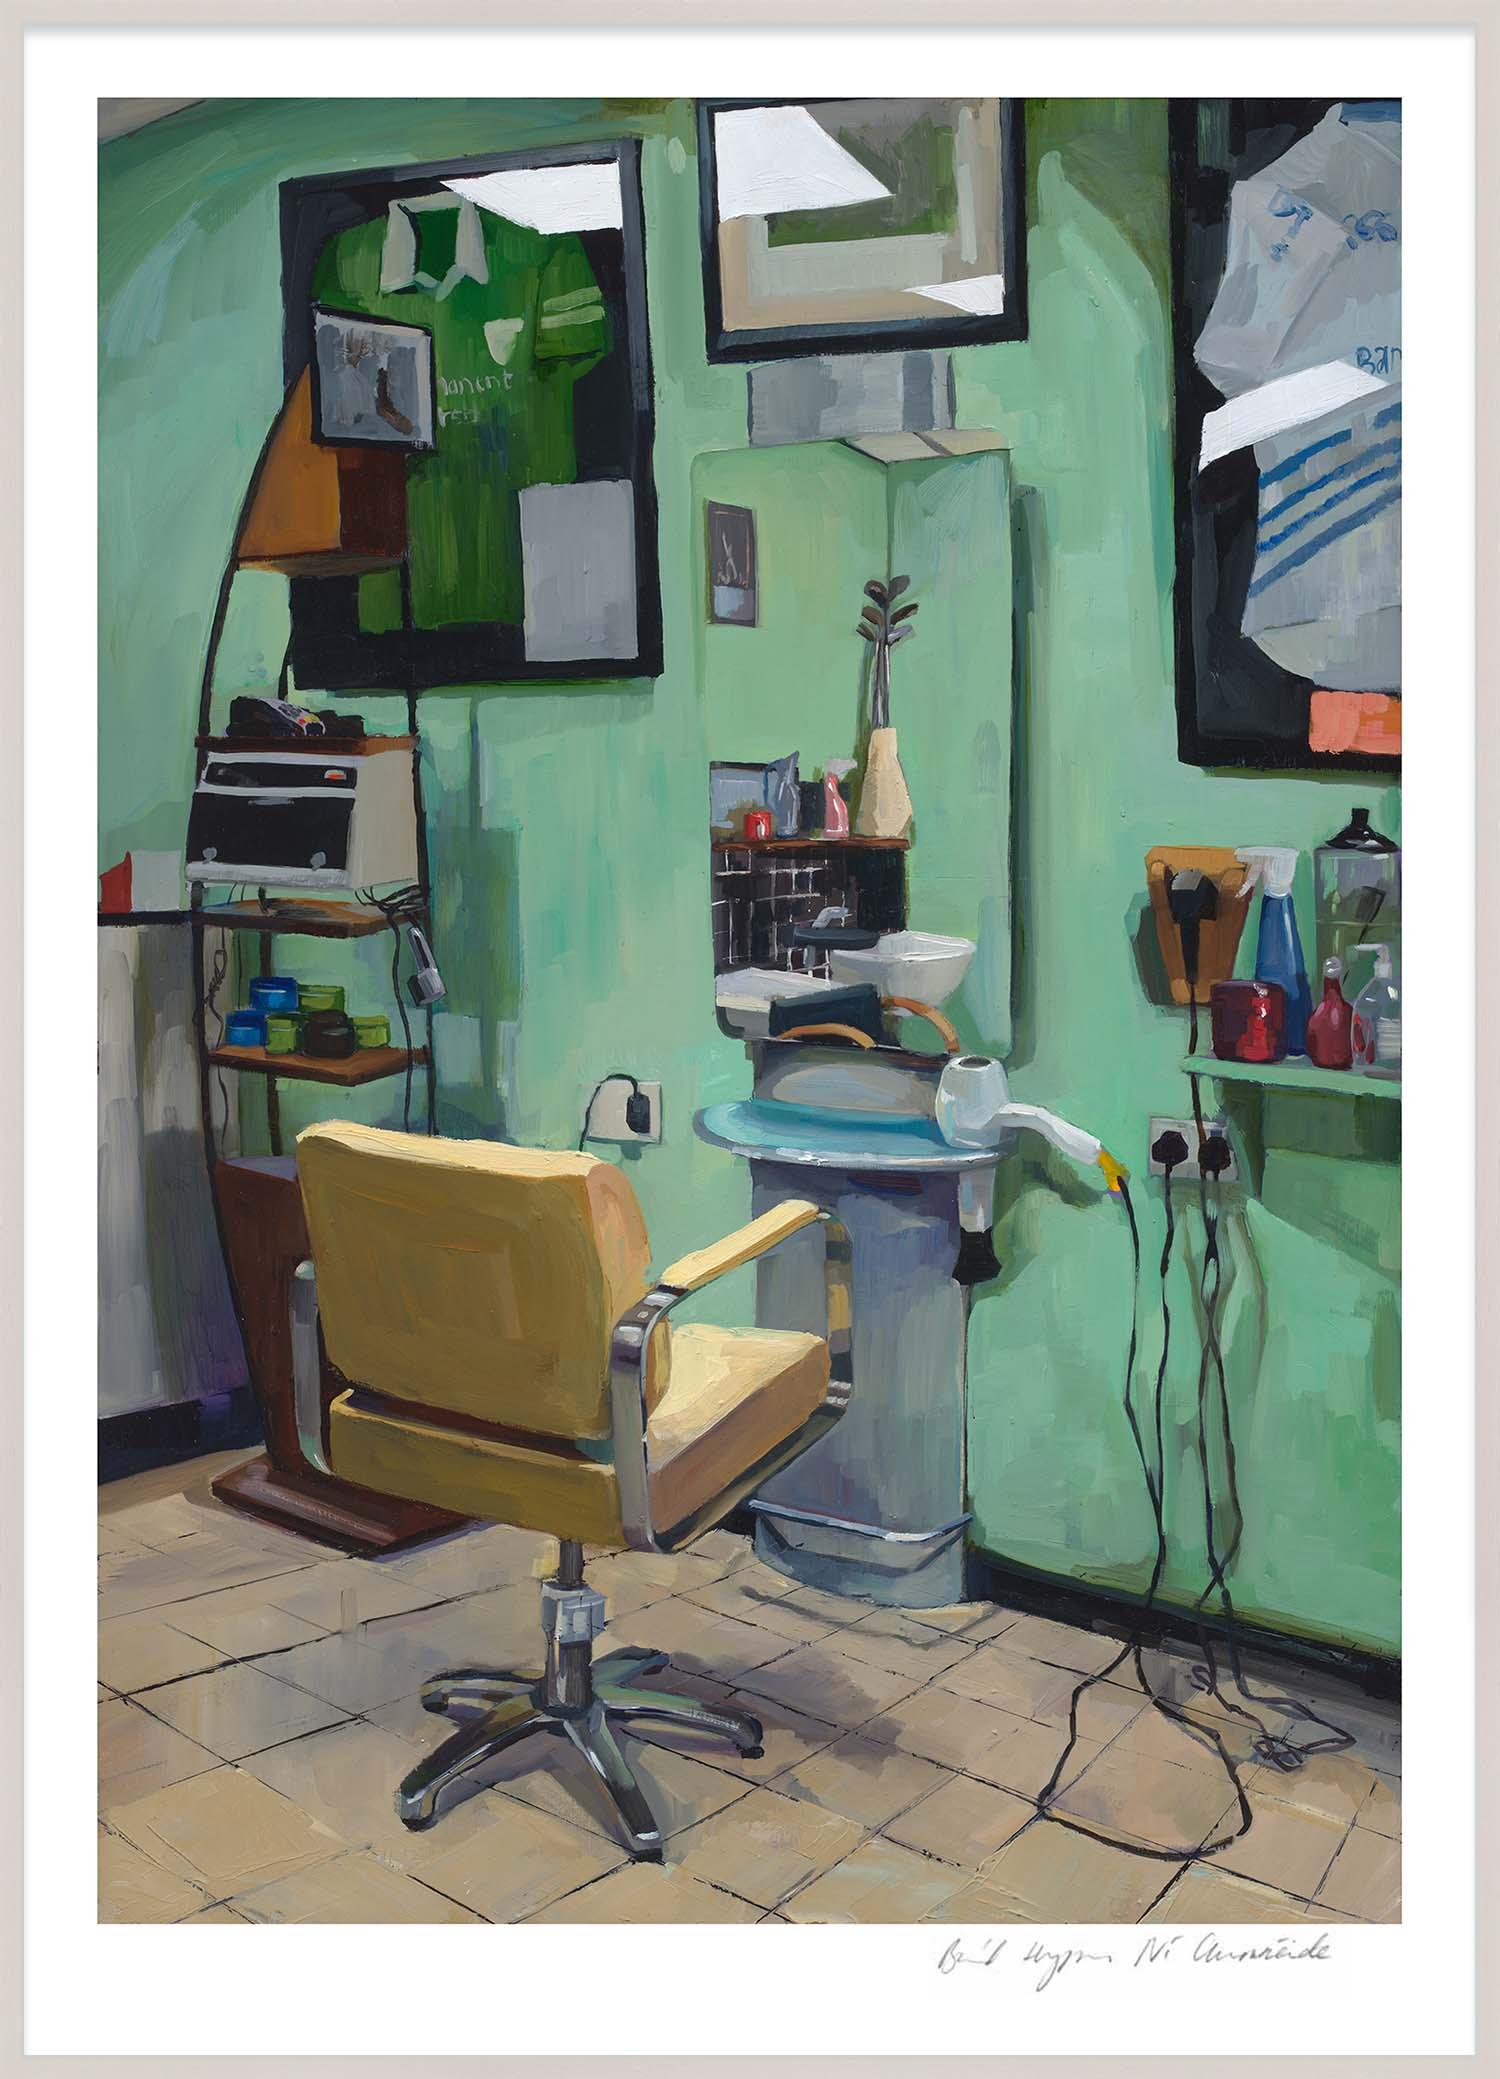 Hang Tough 'Barber Shop' Slip Mounted in Limed Ayous (Framing Only)